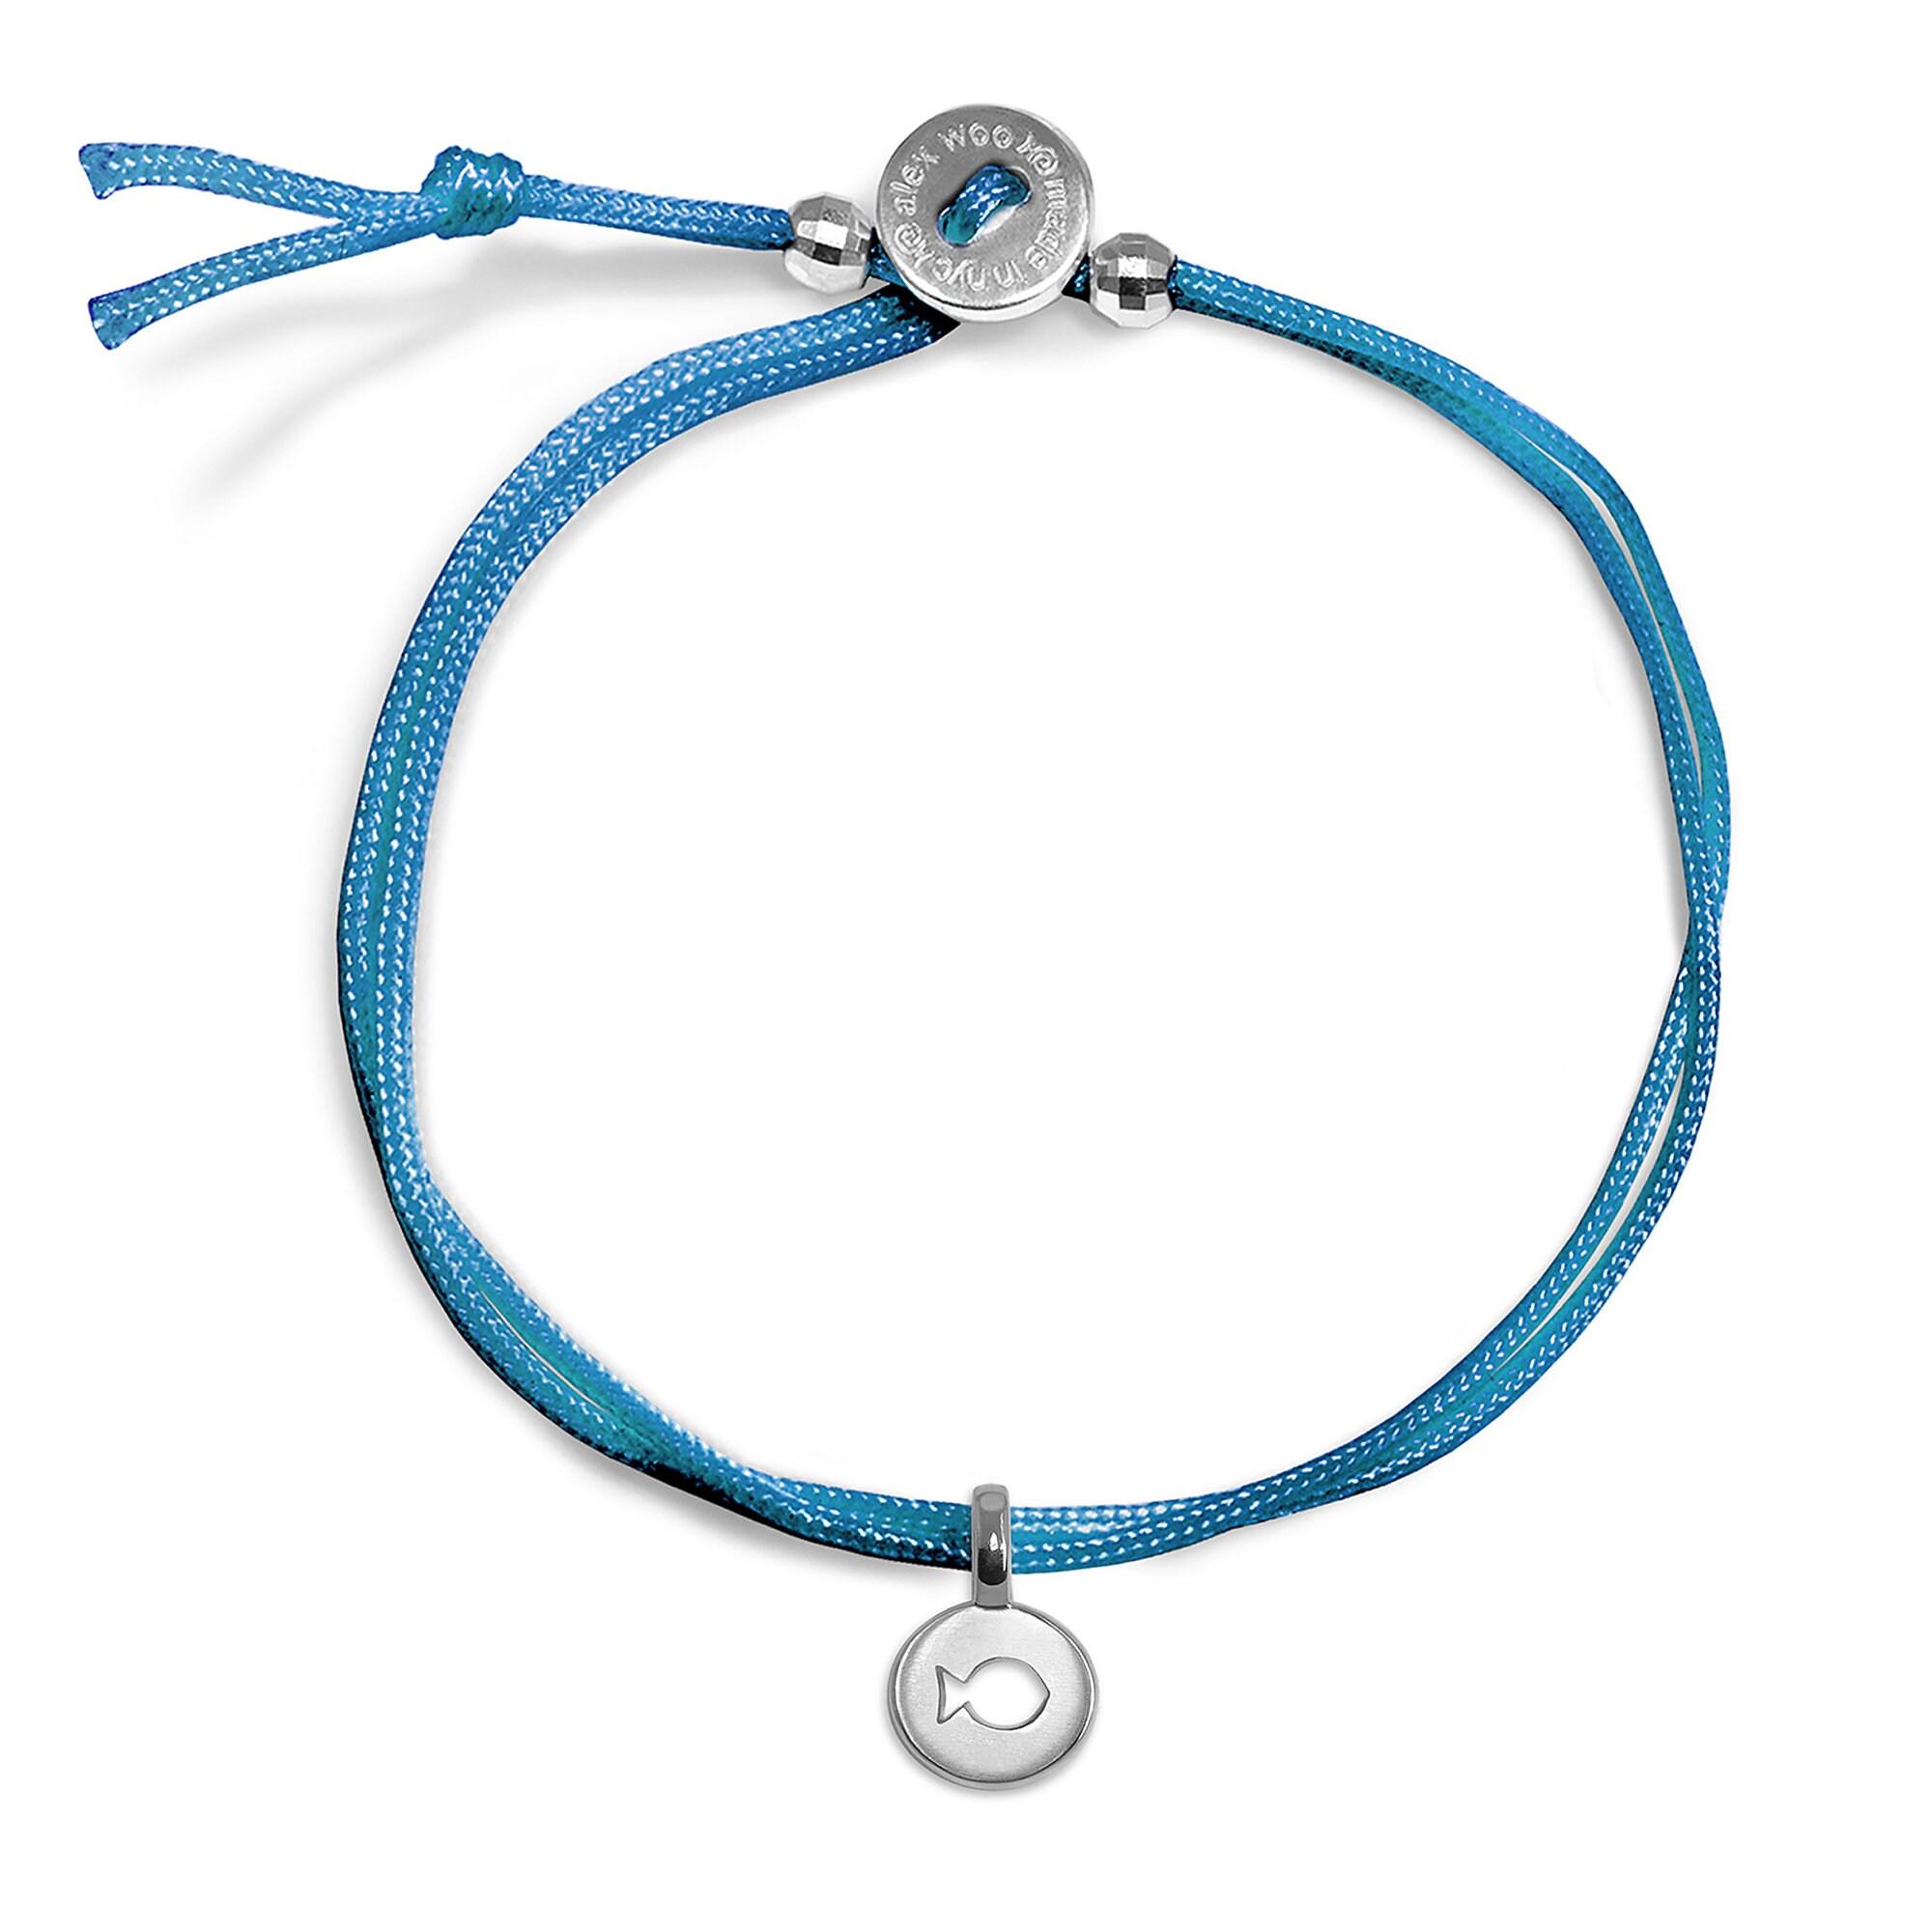 Finding Dory Sterling Silver Bracelet by Alex Woo